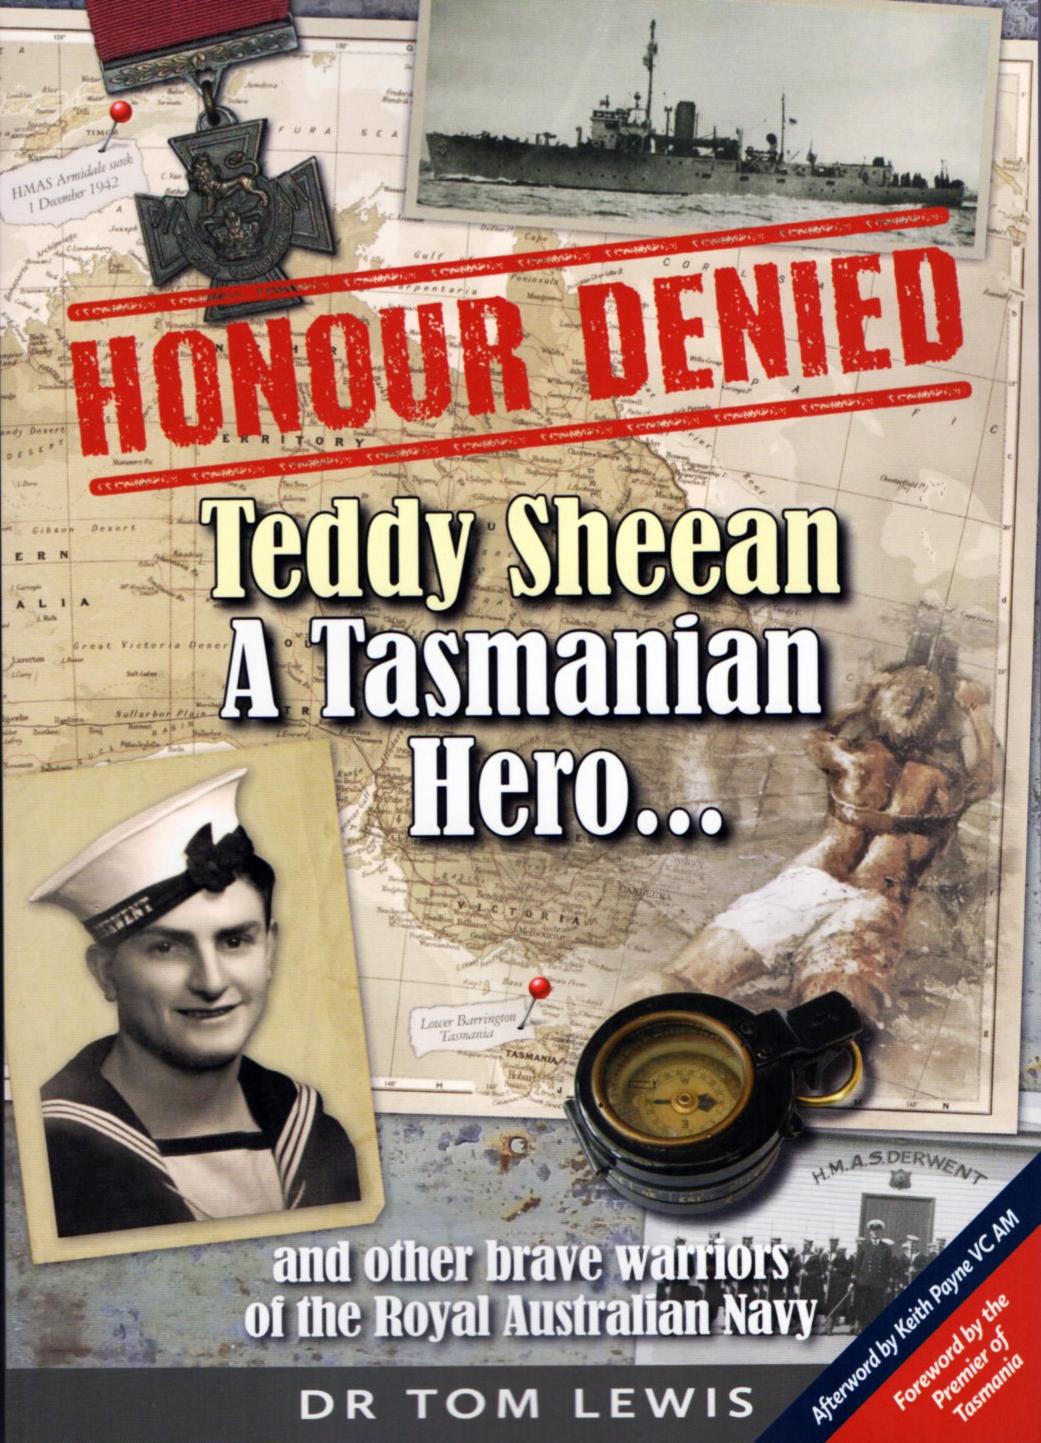 Honour Denied - Teddy Sheean, a Tasmanian Hero